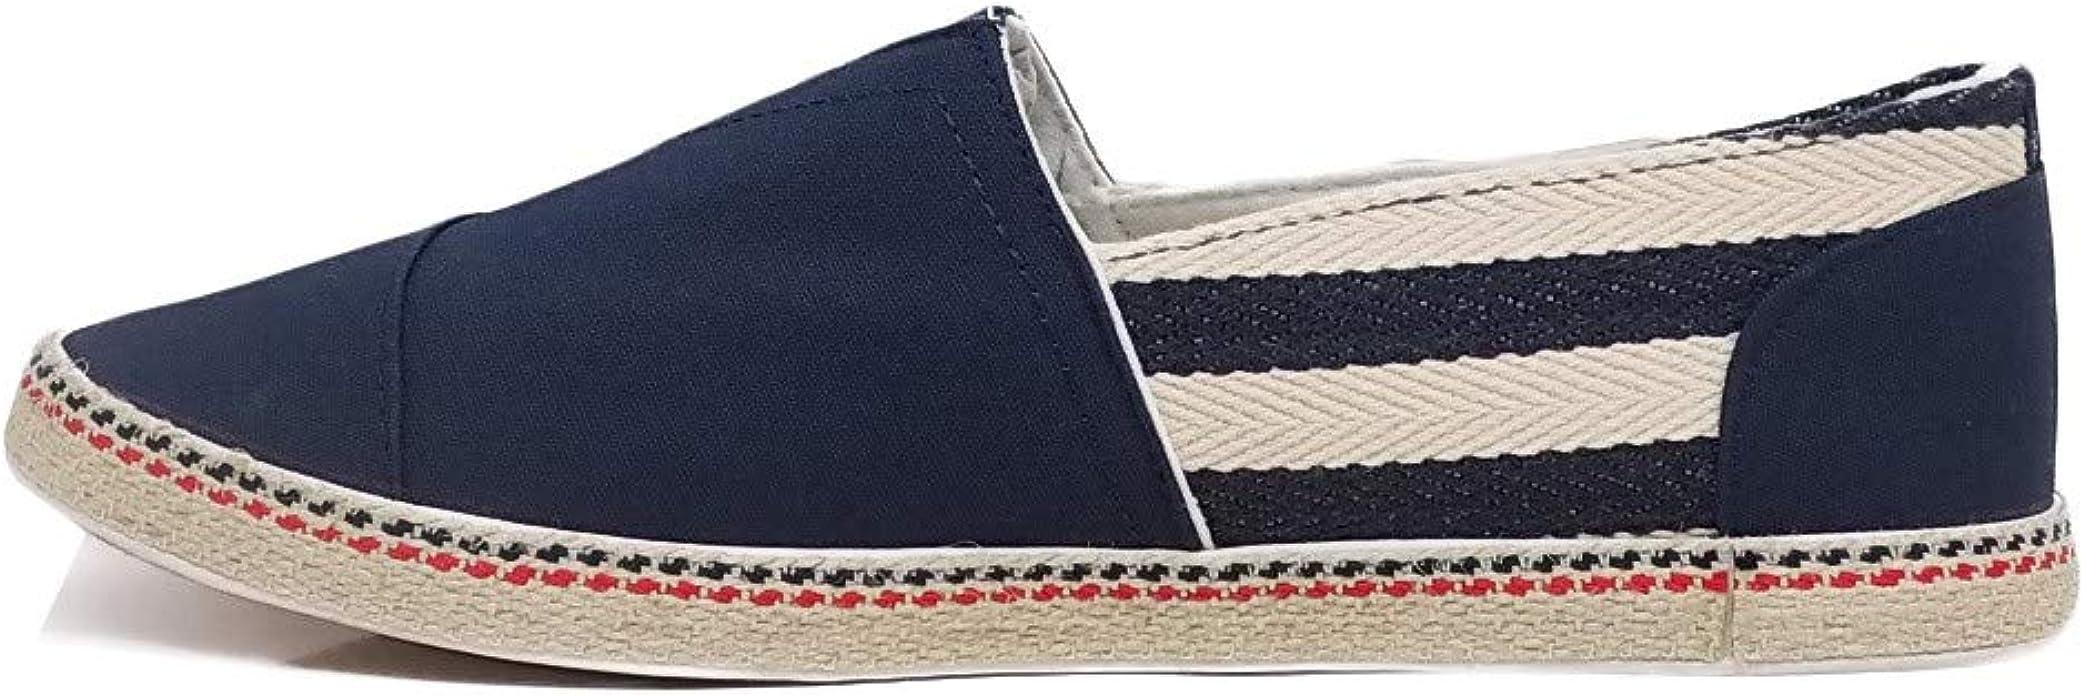 Black Saints Footwear Espadrillas Basse per Uomo Stringata con Strisce Payne